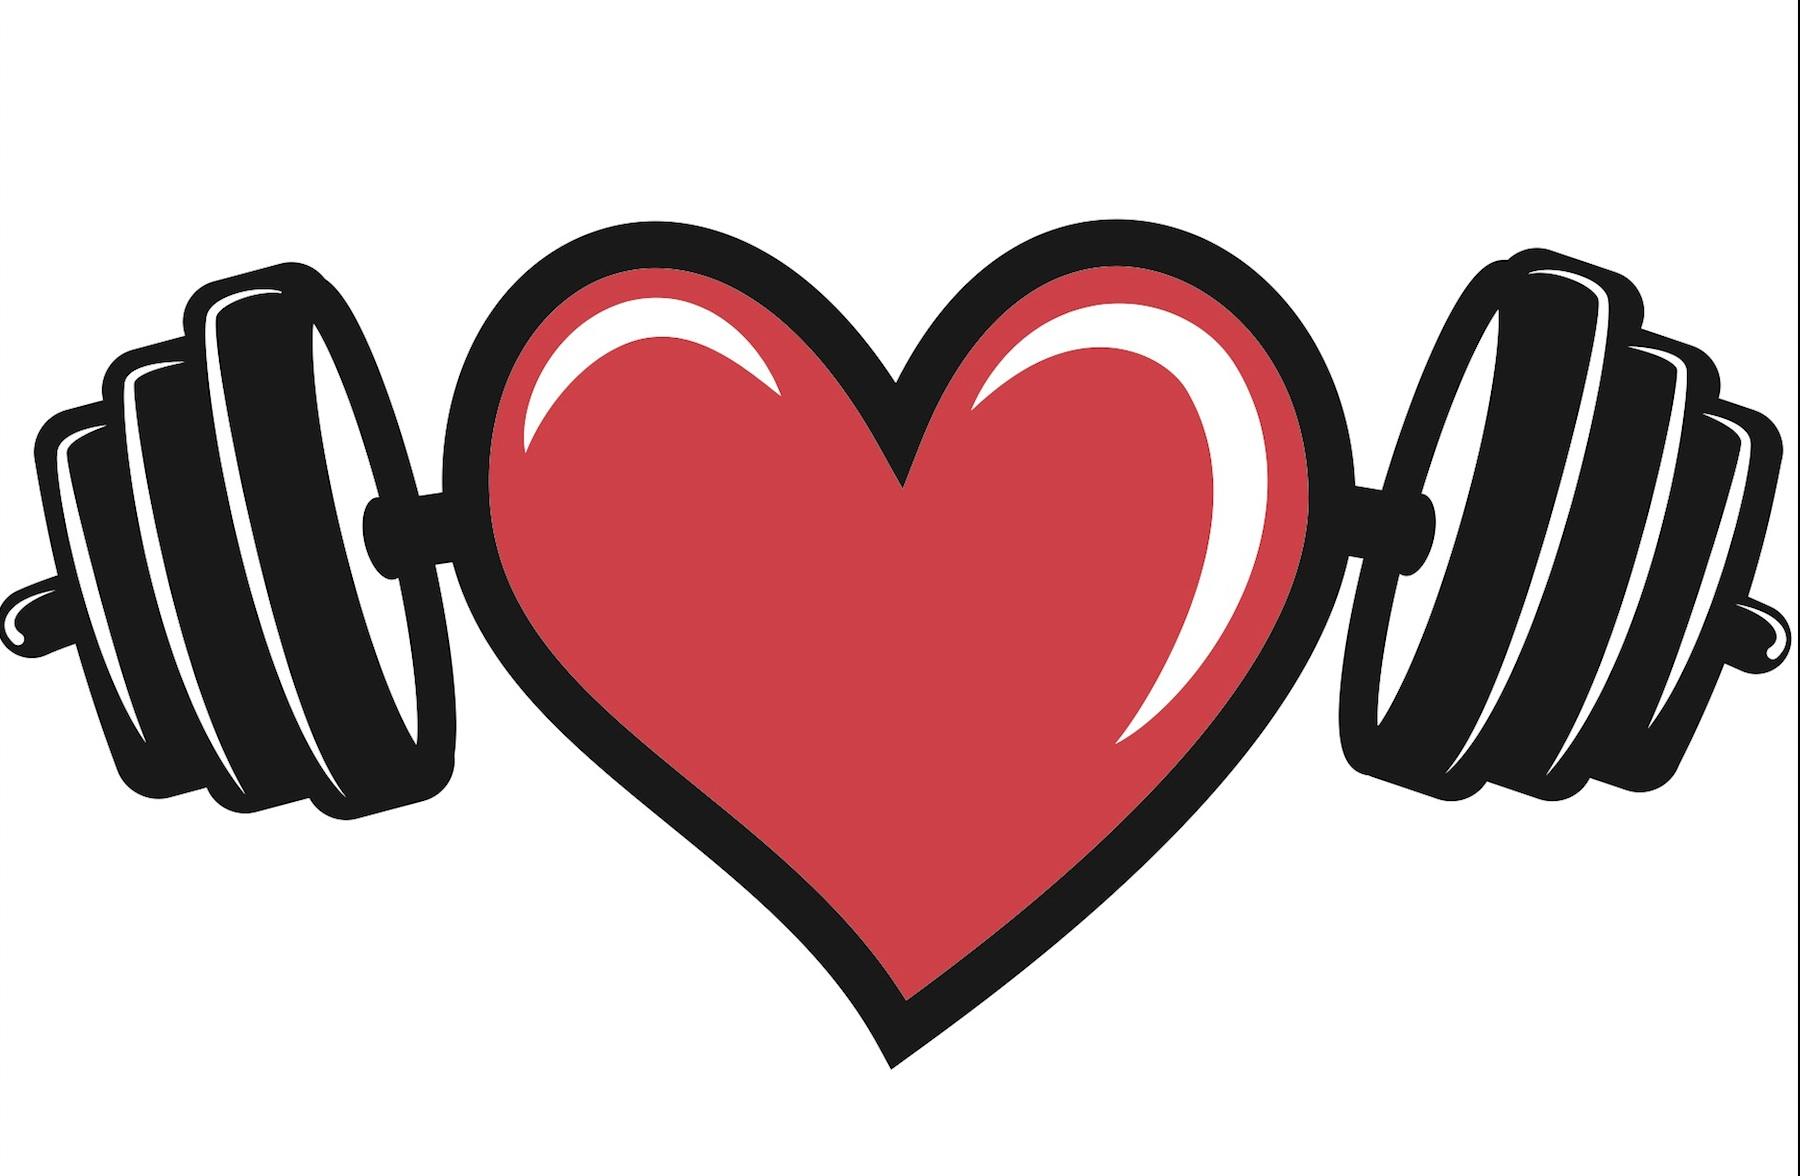 Campioni: giganti nel cuore!